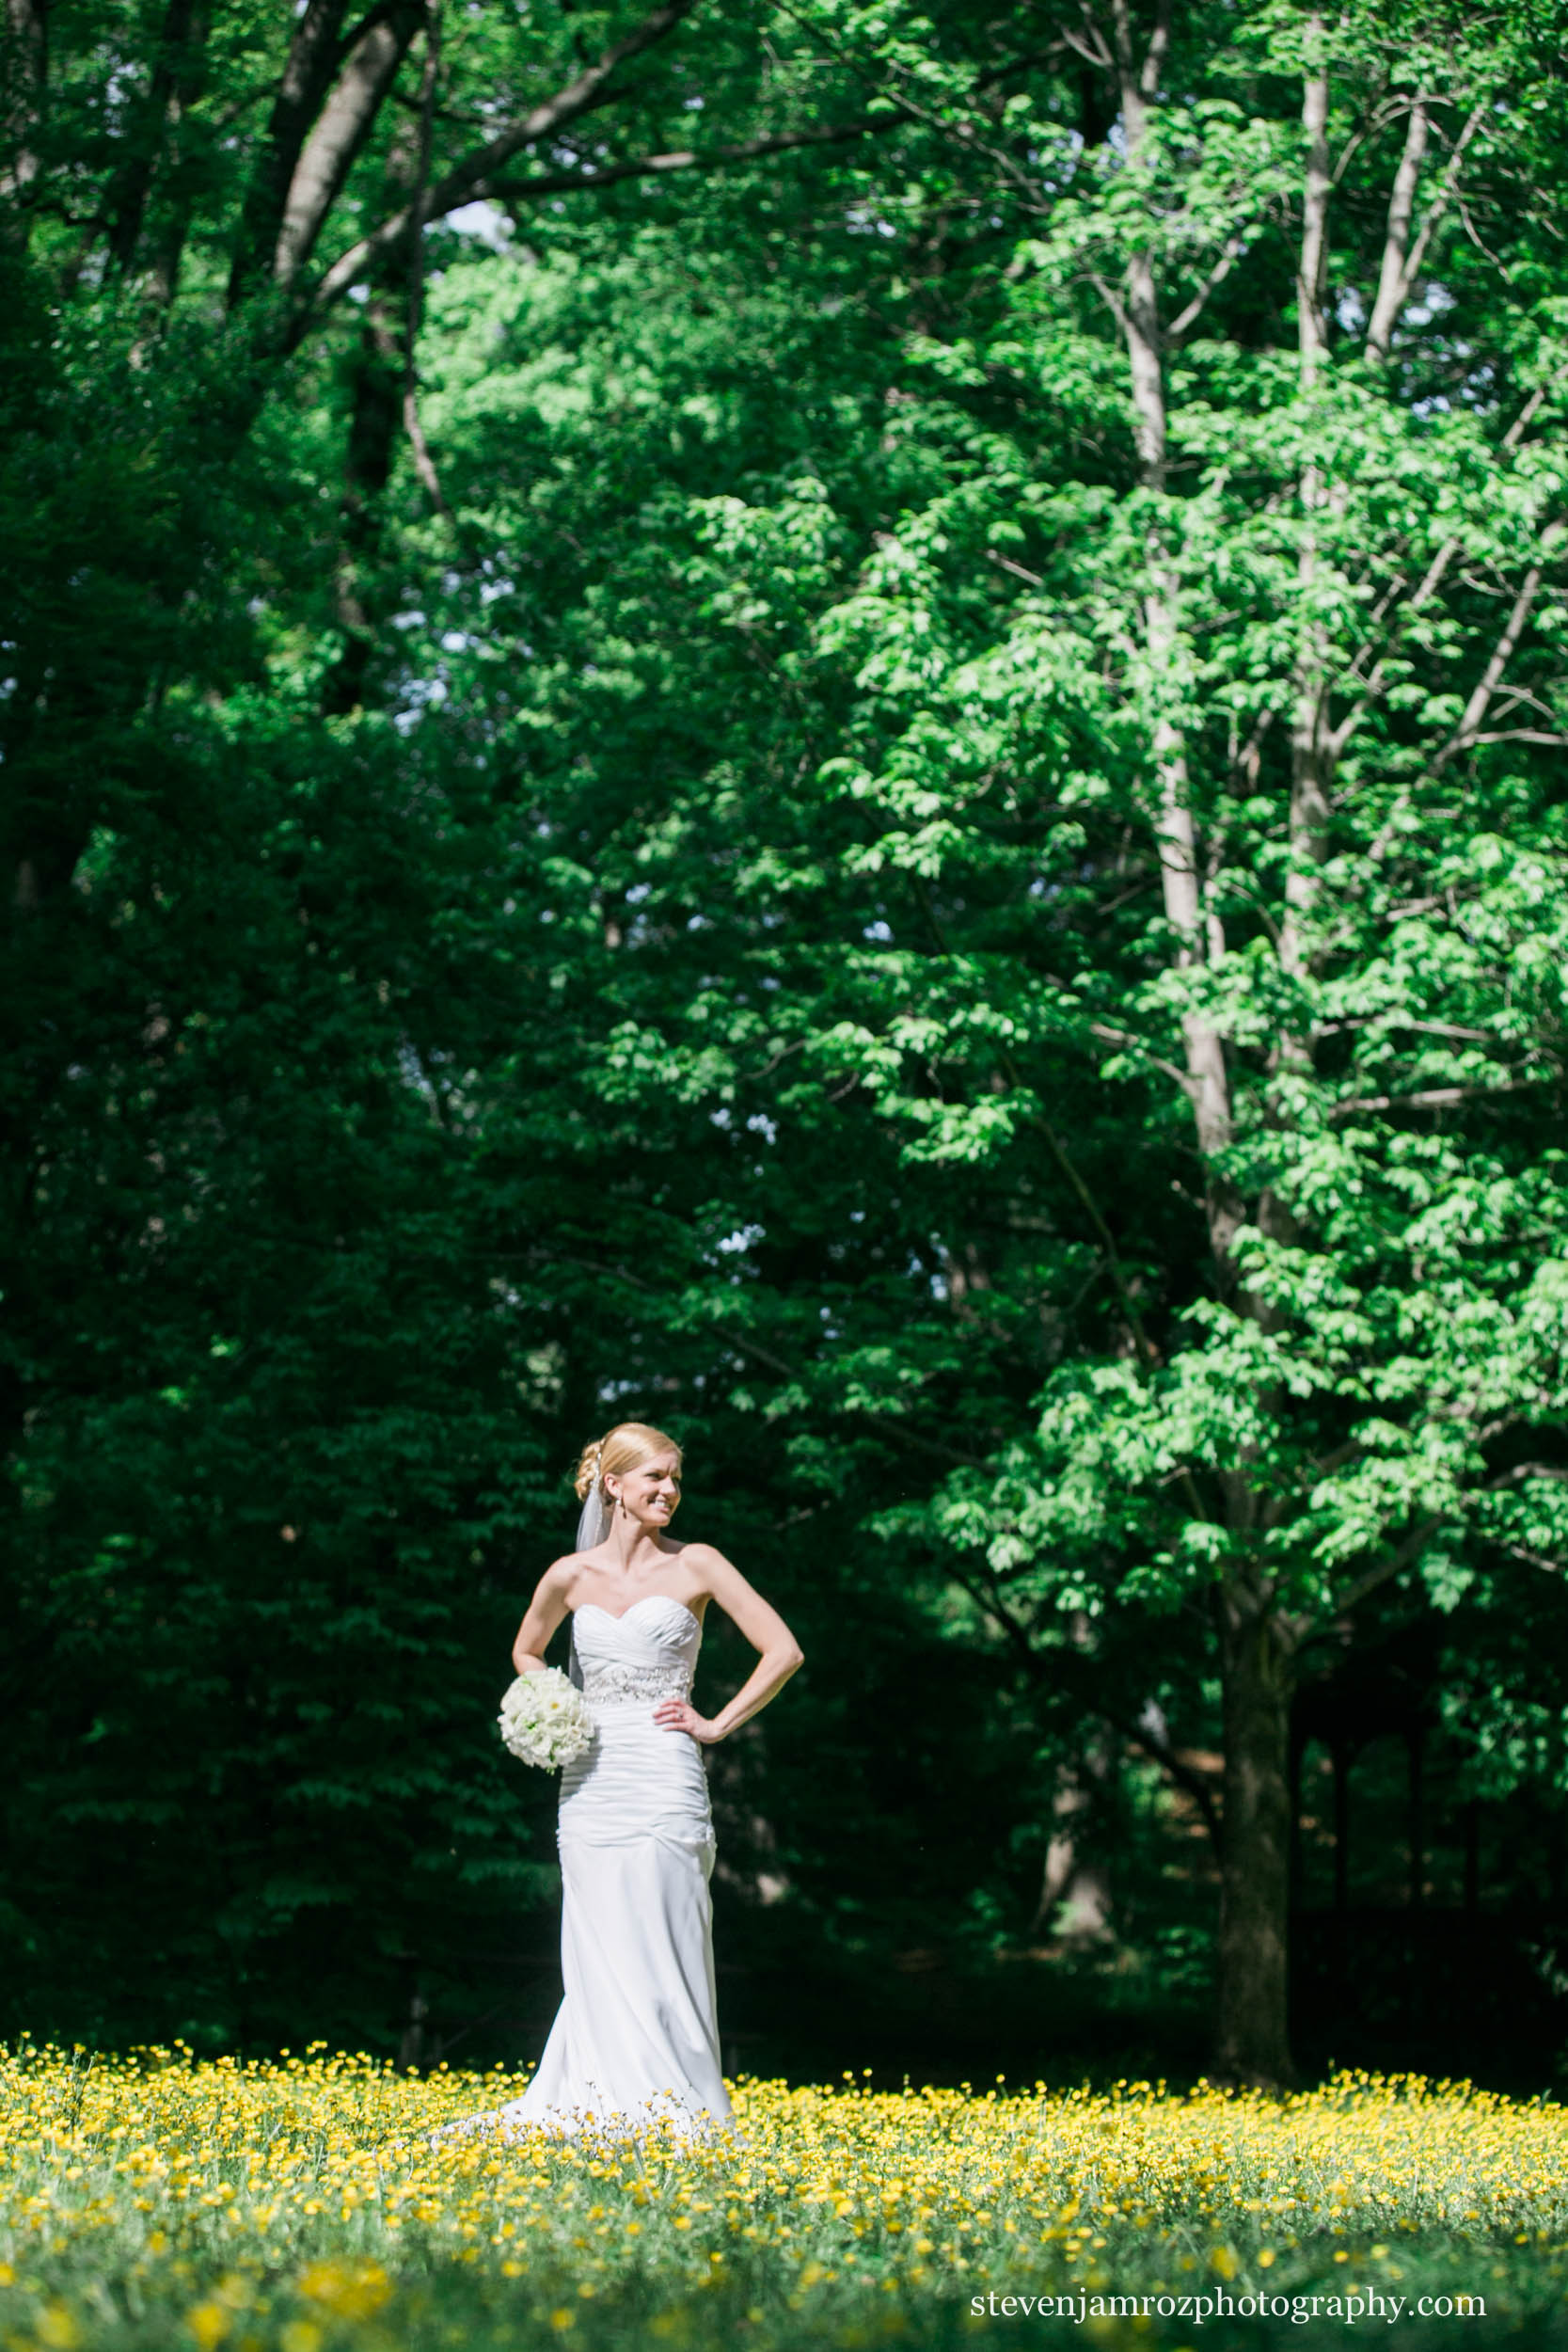 bride-in-flower-field-raleigh-nc-steven-jamroz-photography-0051.jpg